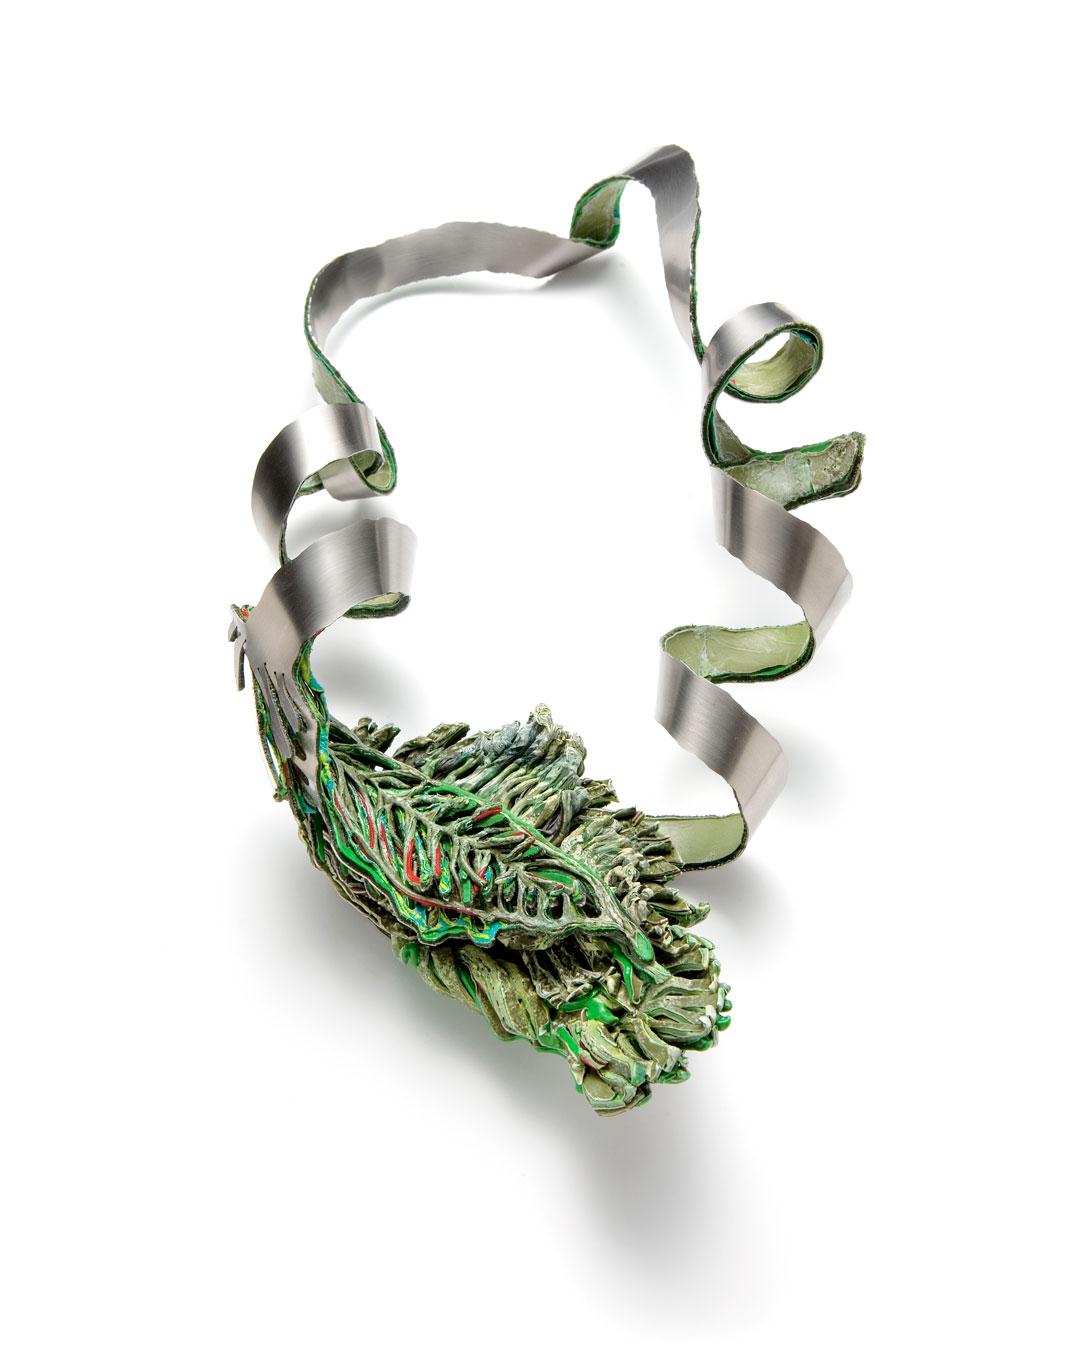 Ineke Heerkens, Dwarrelend Blad (Dwarf Leaf),  2011, necklace; polyethylene, stainless steel, oxidised silver, 320 x 165 x 75 mm, €2700